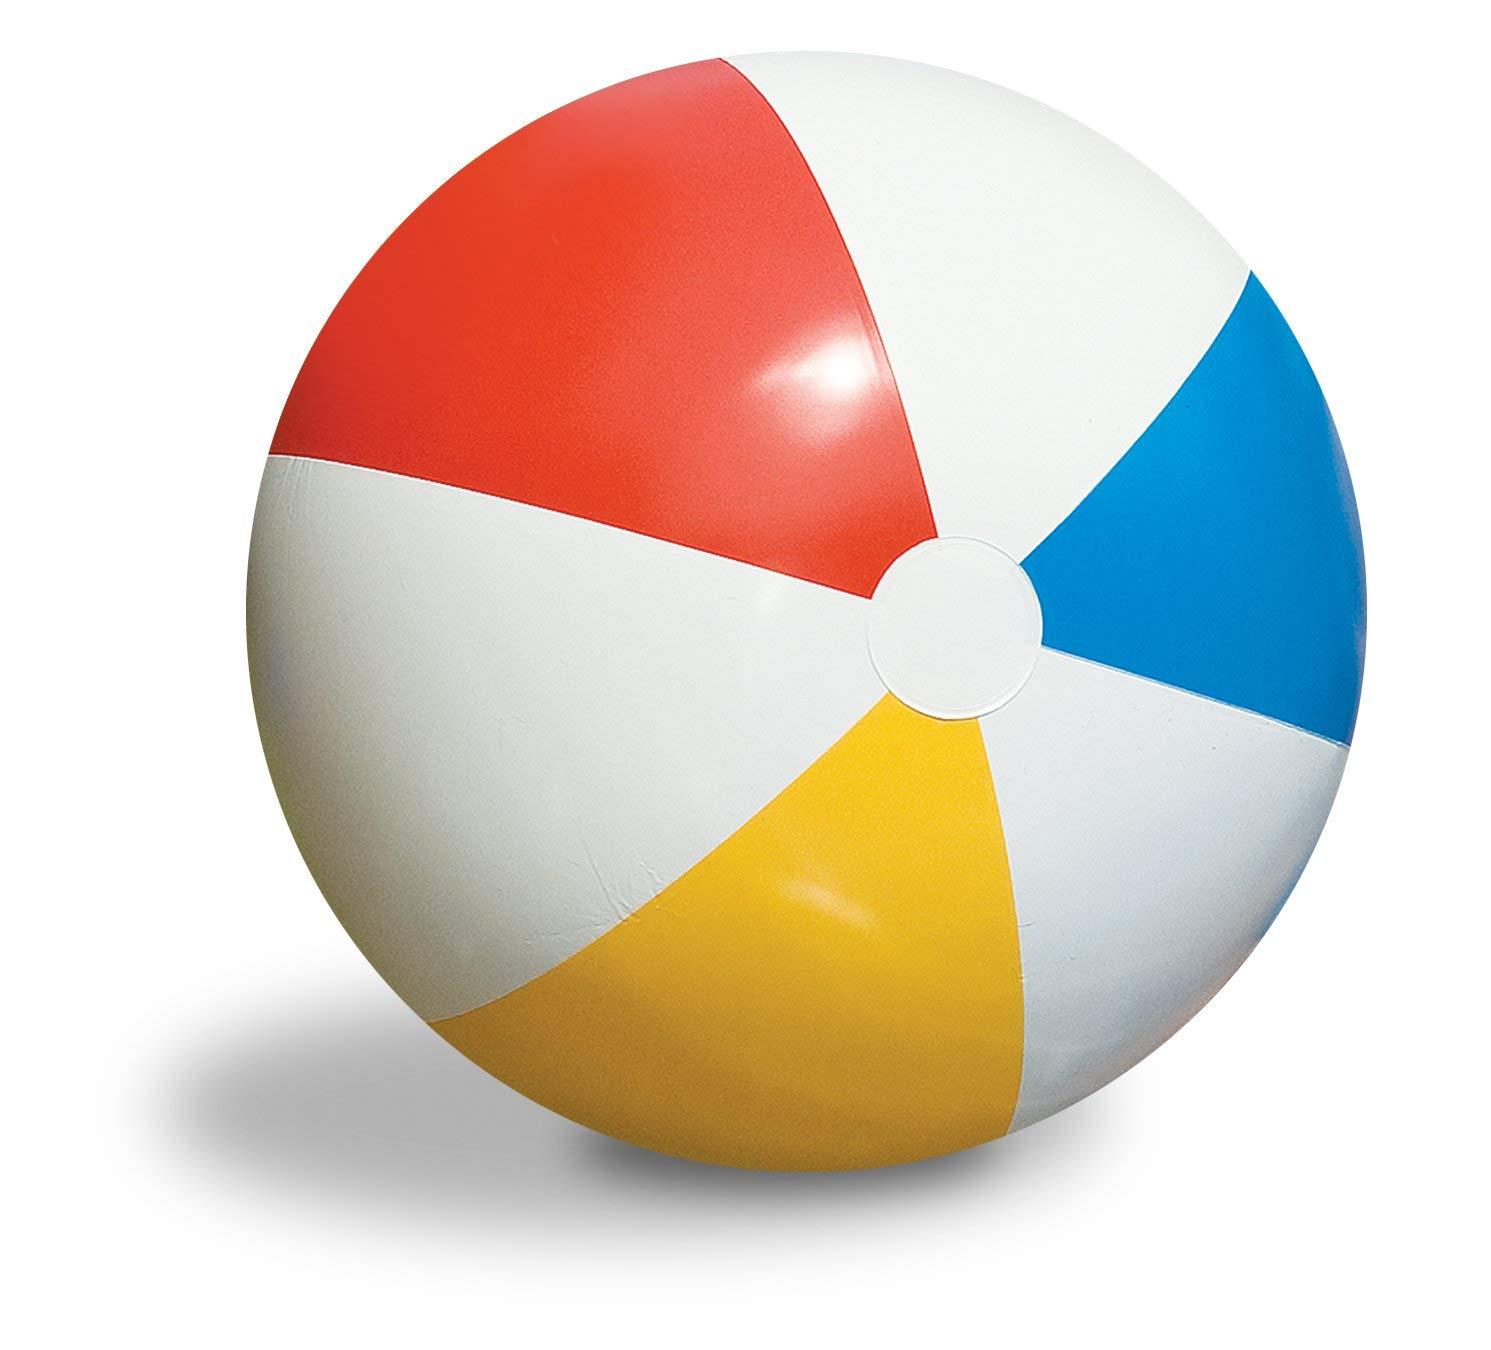 Beachball clipart many ball. Amazon com swimline classic